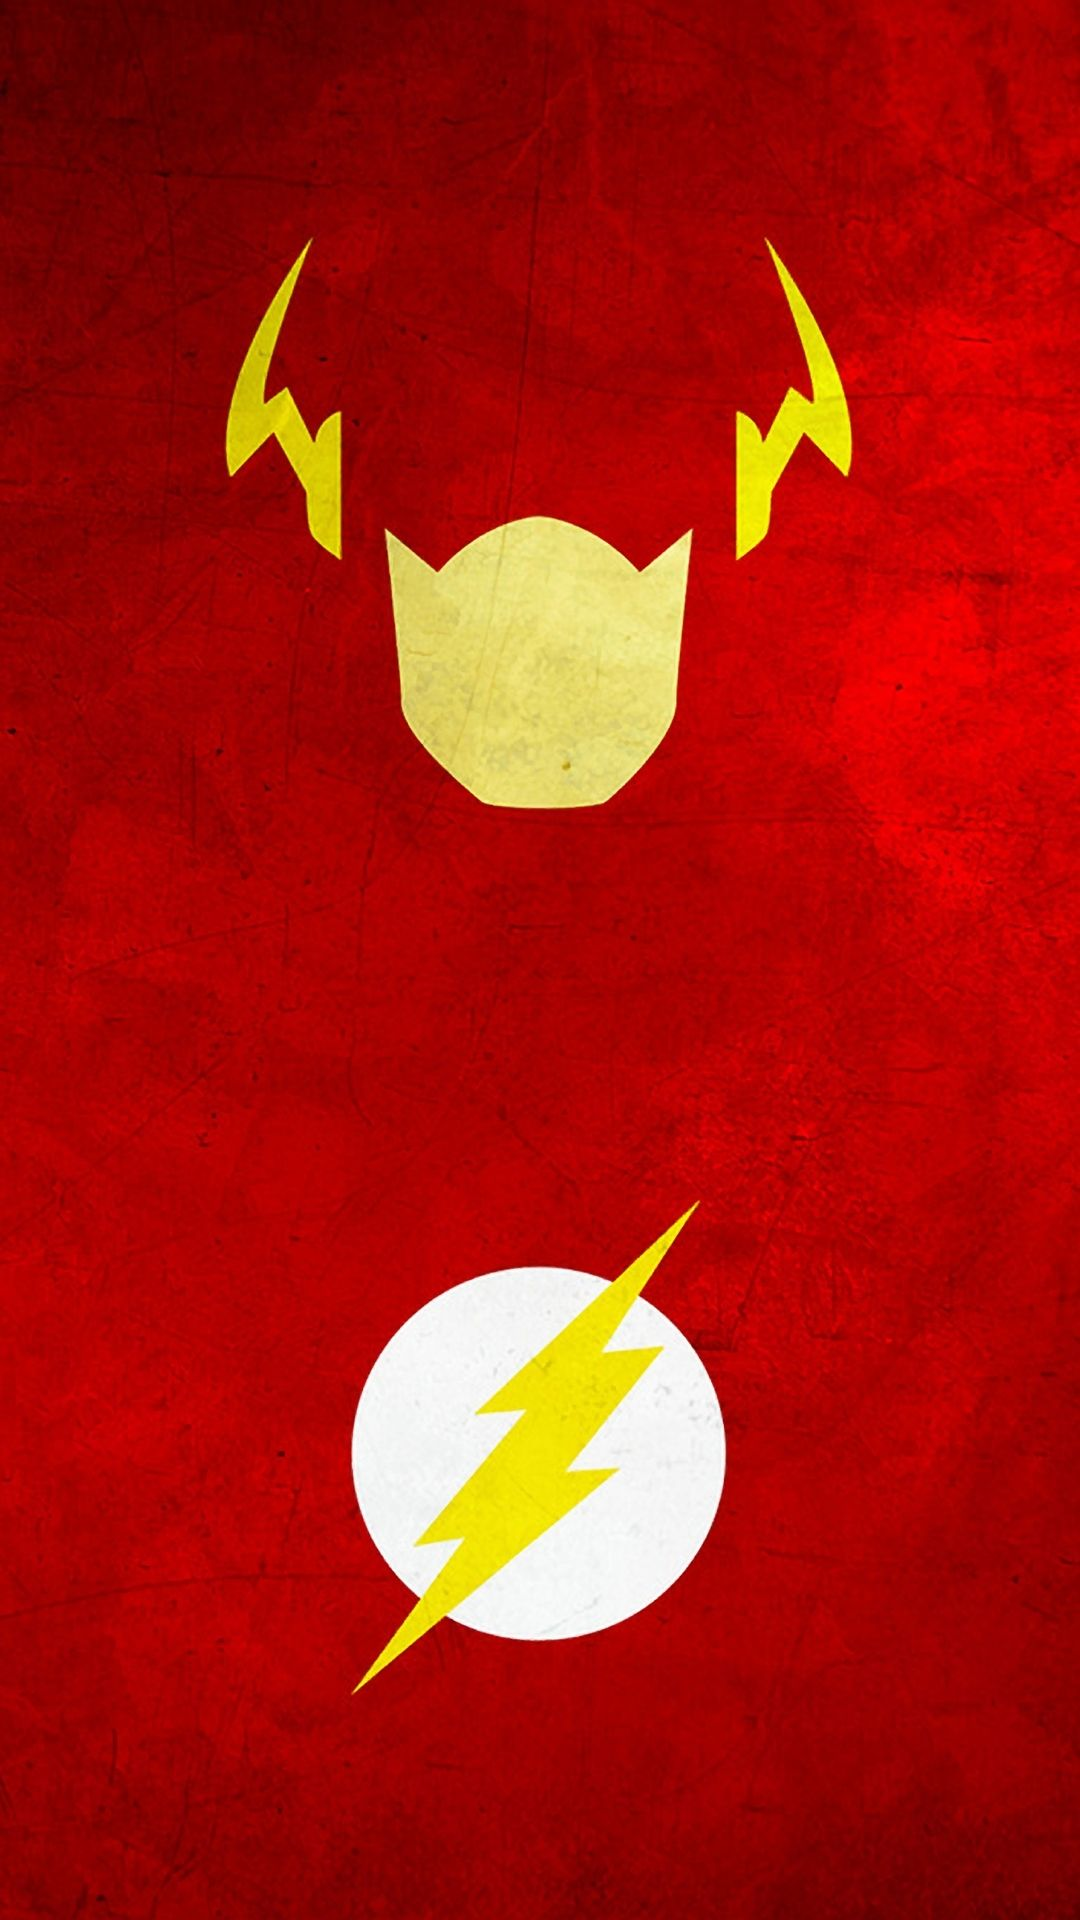 Wallpaper iphone superhero - Community Post Minimalist Superhero Posters